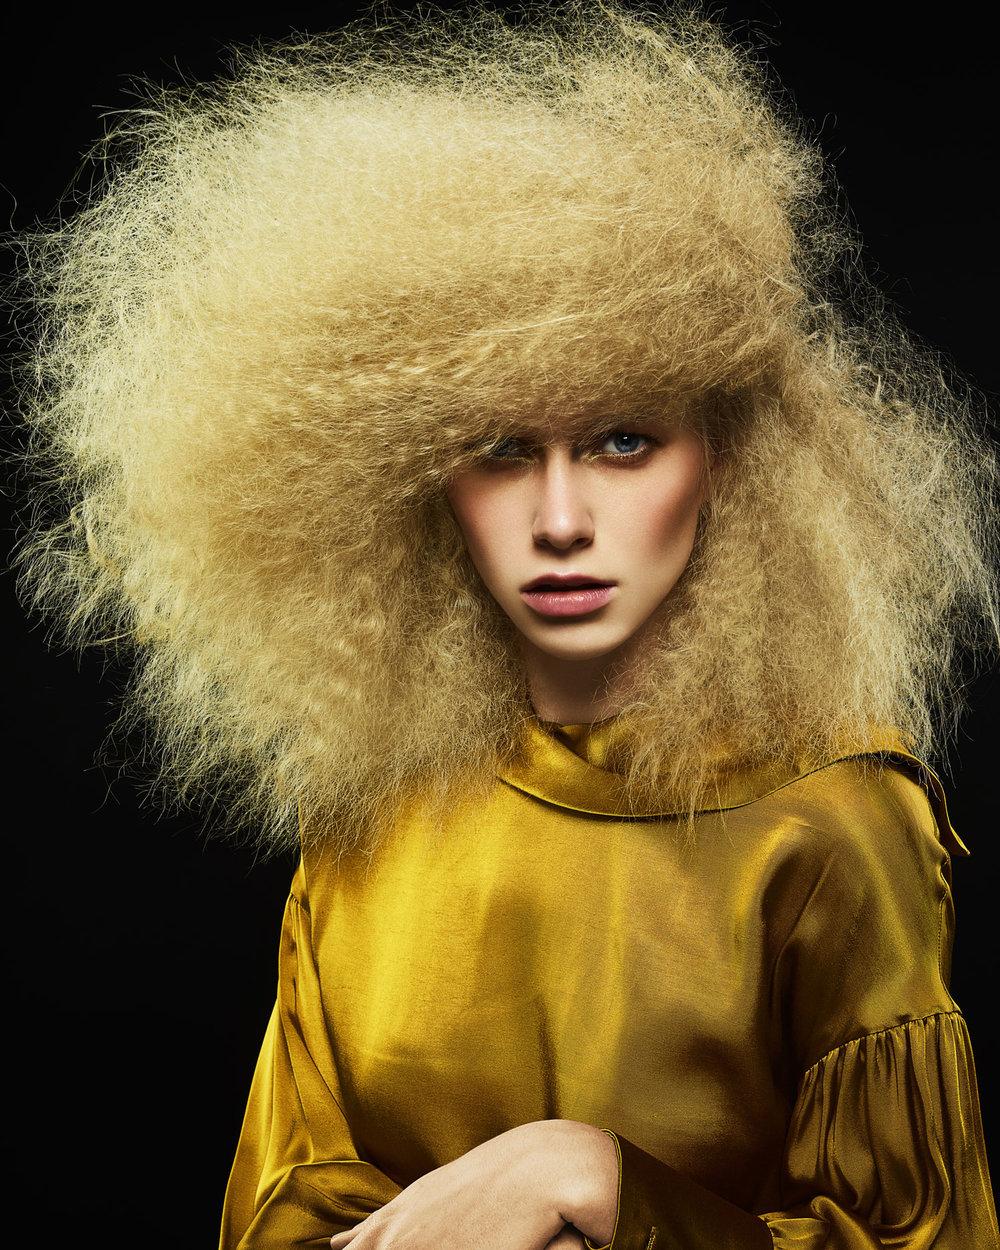 sarah-cochran-wardrobe-stylist-minneapolis-st-paul-creative-stylist-4.jpg